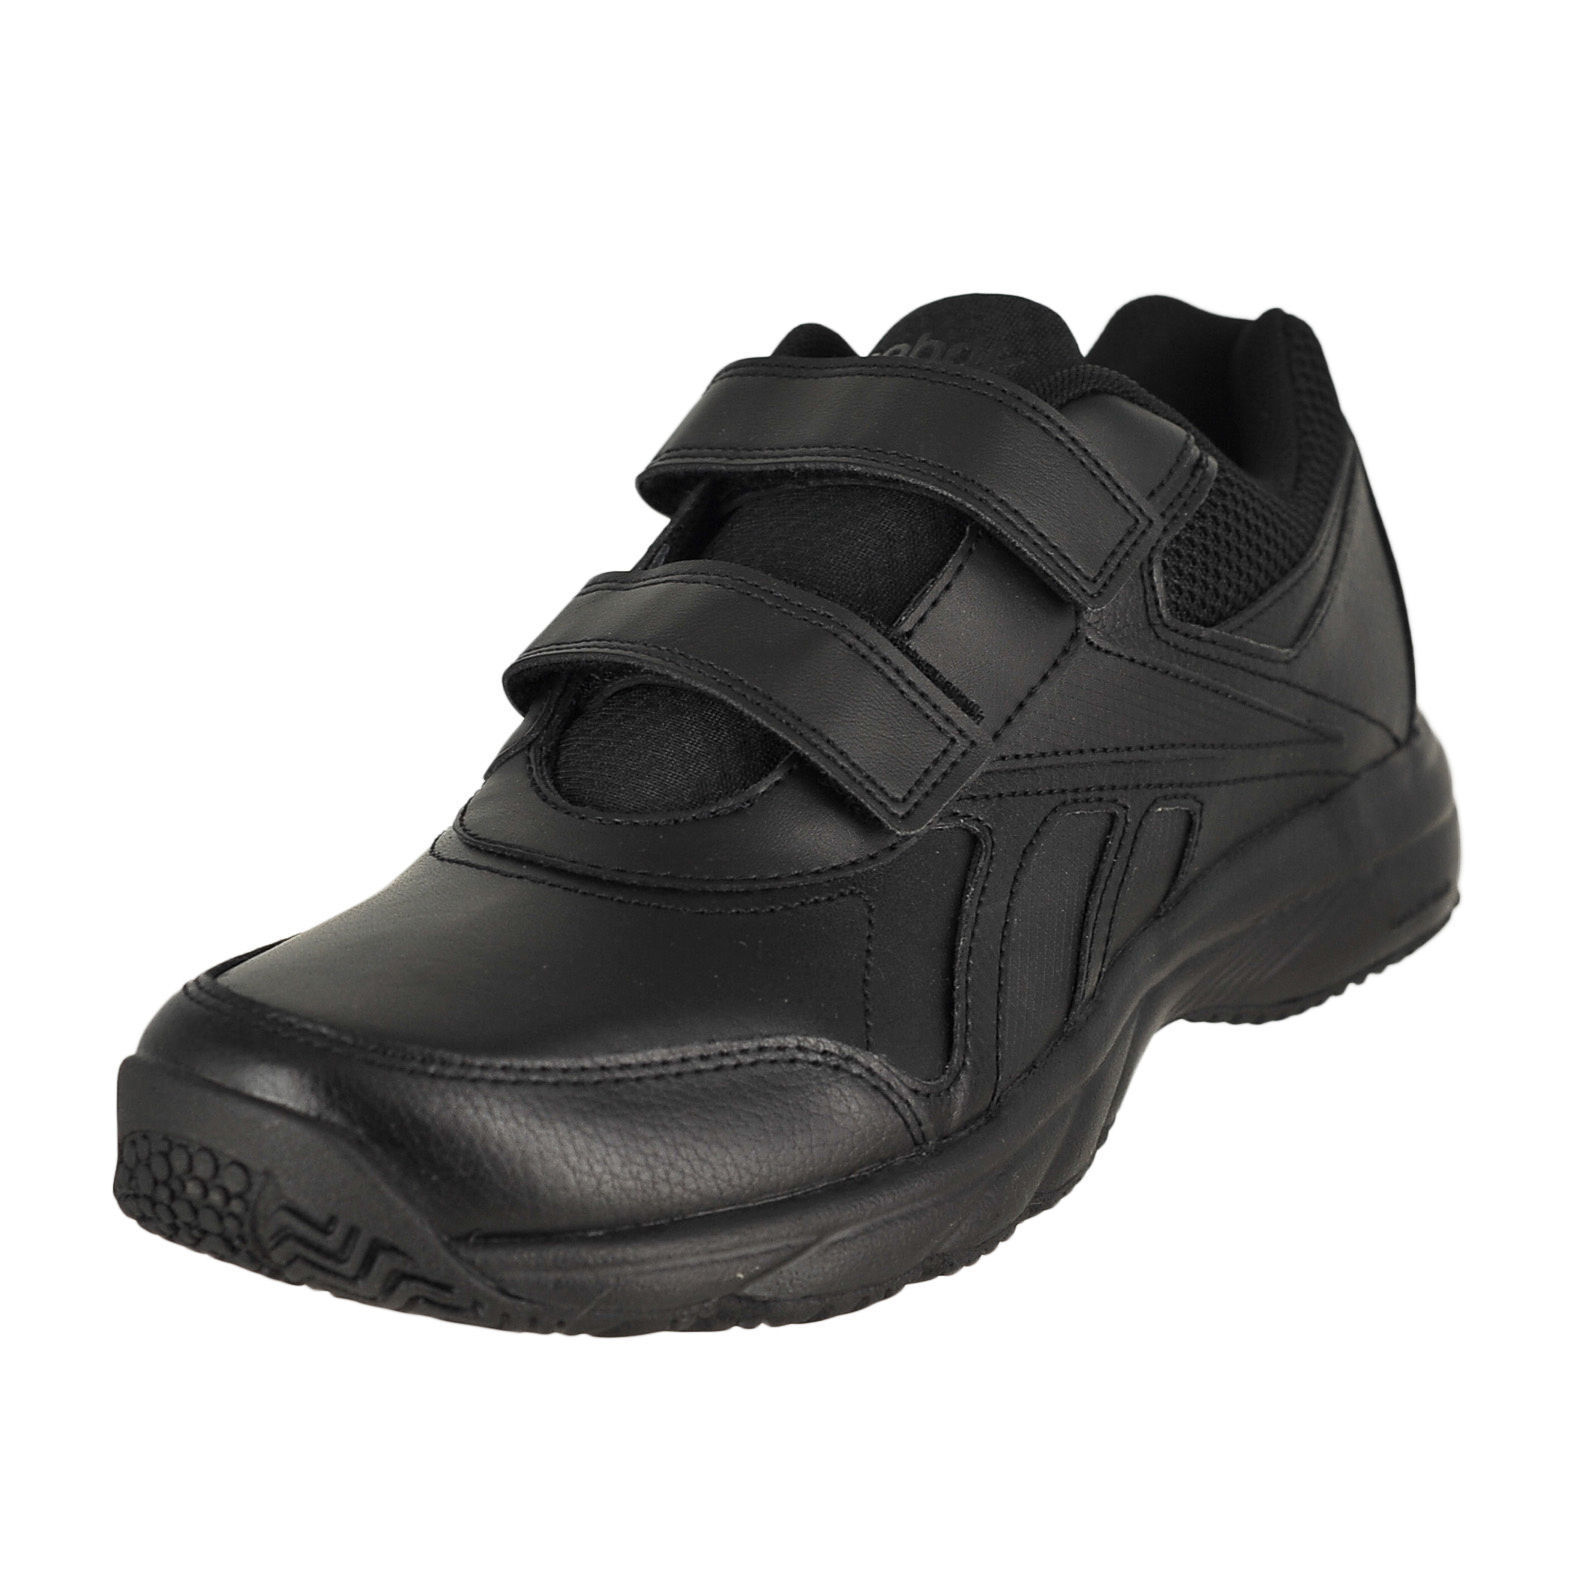 623f0ce7be6 Reebok Work N Cushion 2.0 KC V70734 Black Working Shoes Medium Mens ...